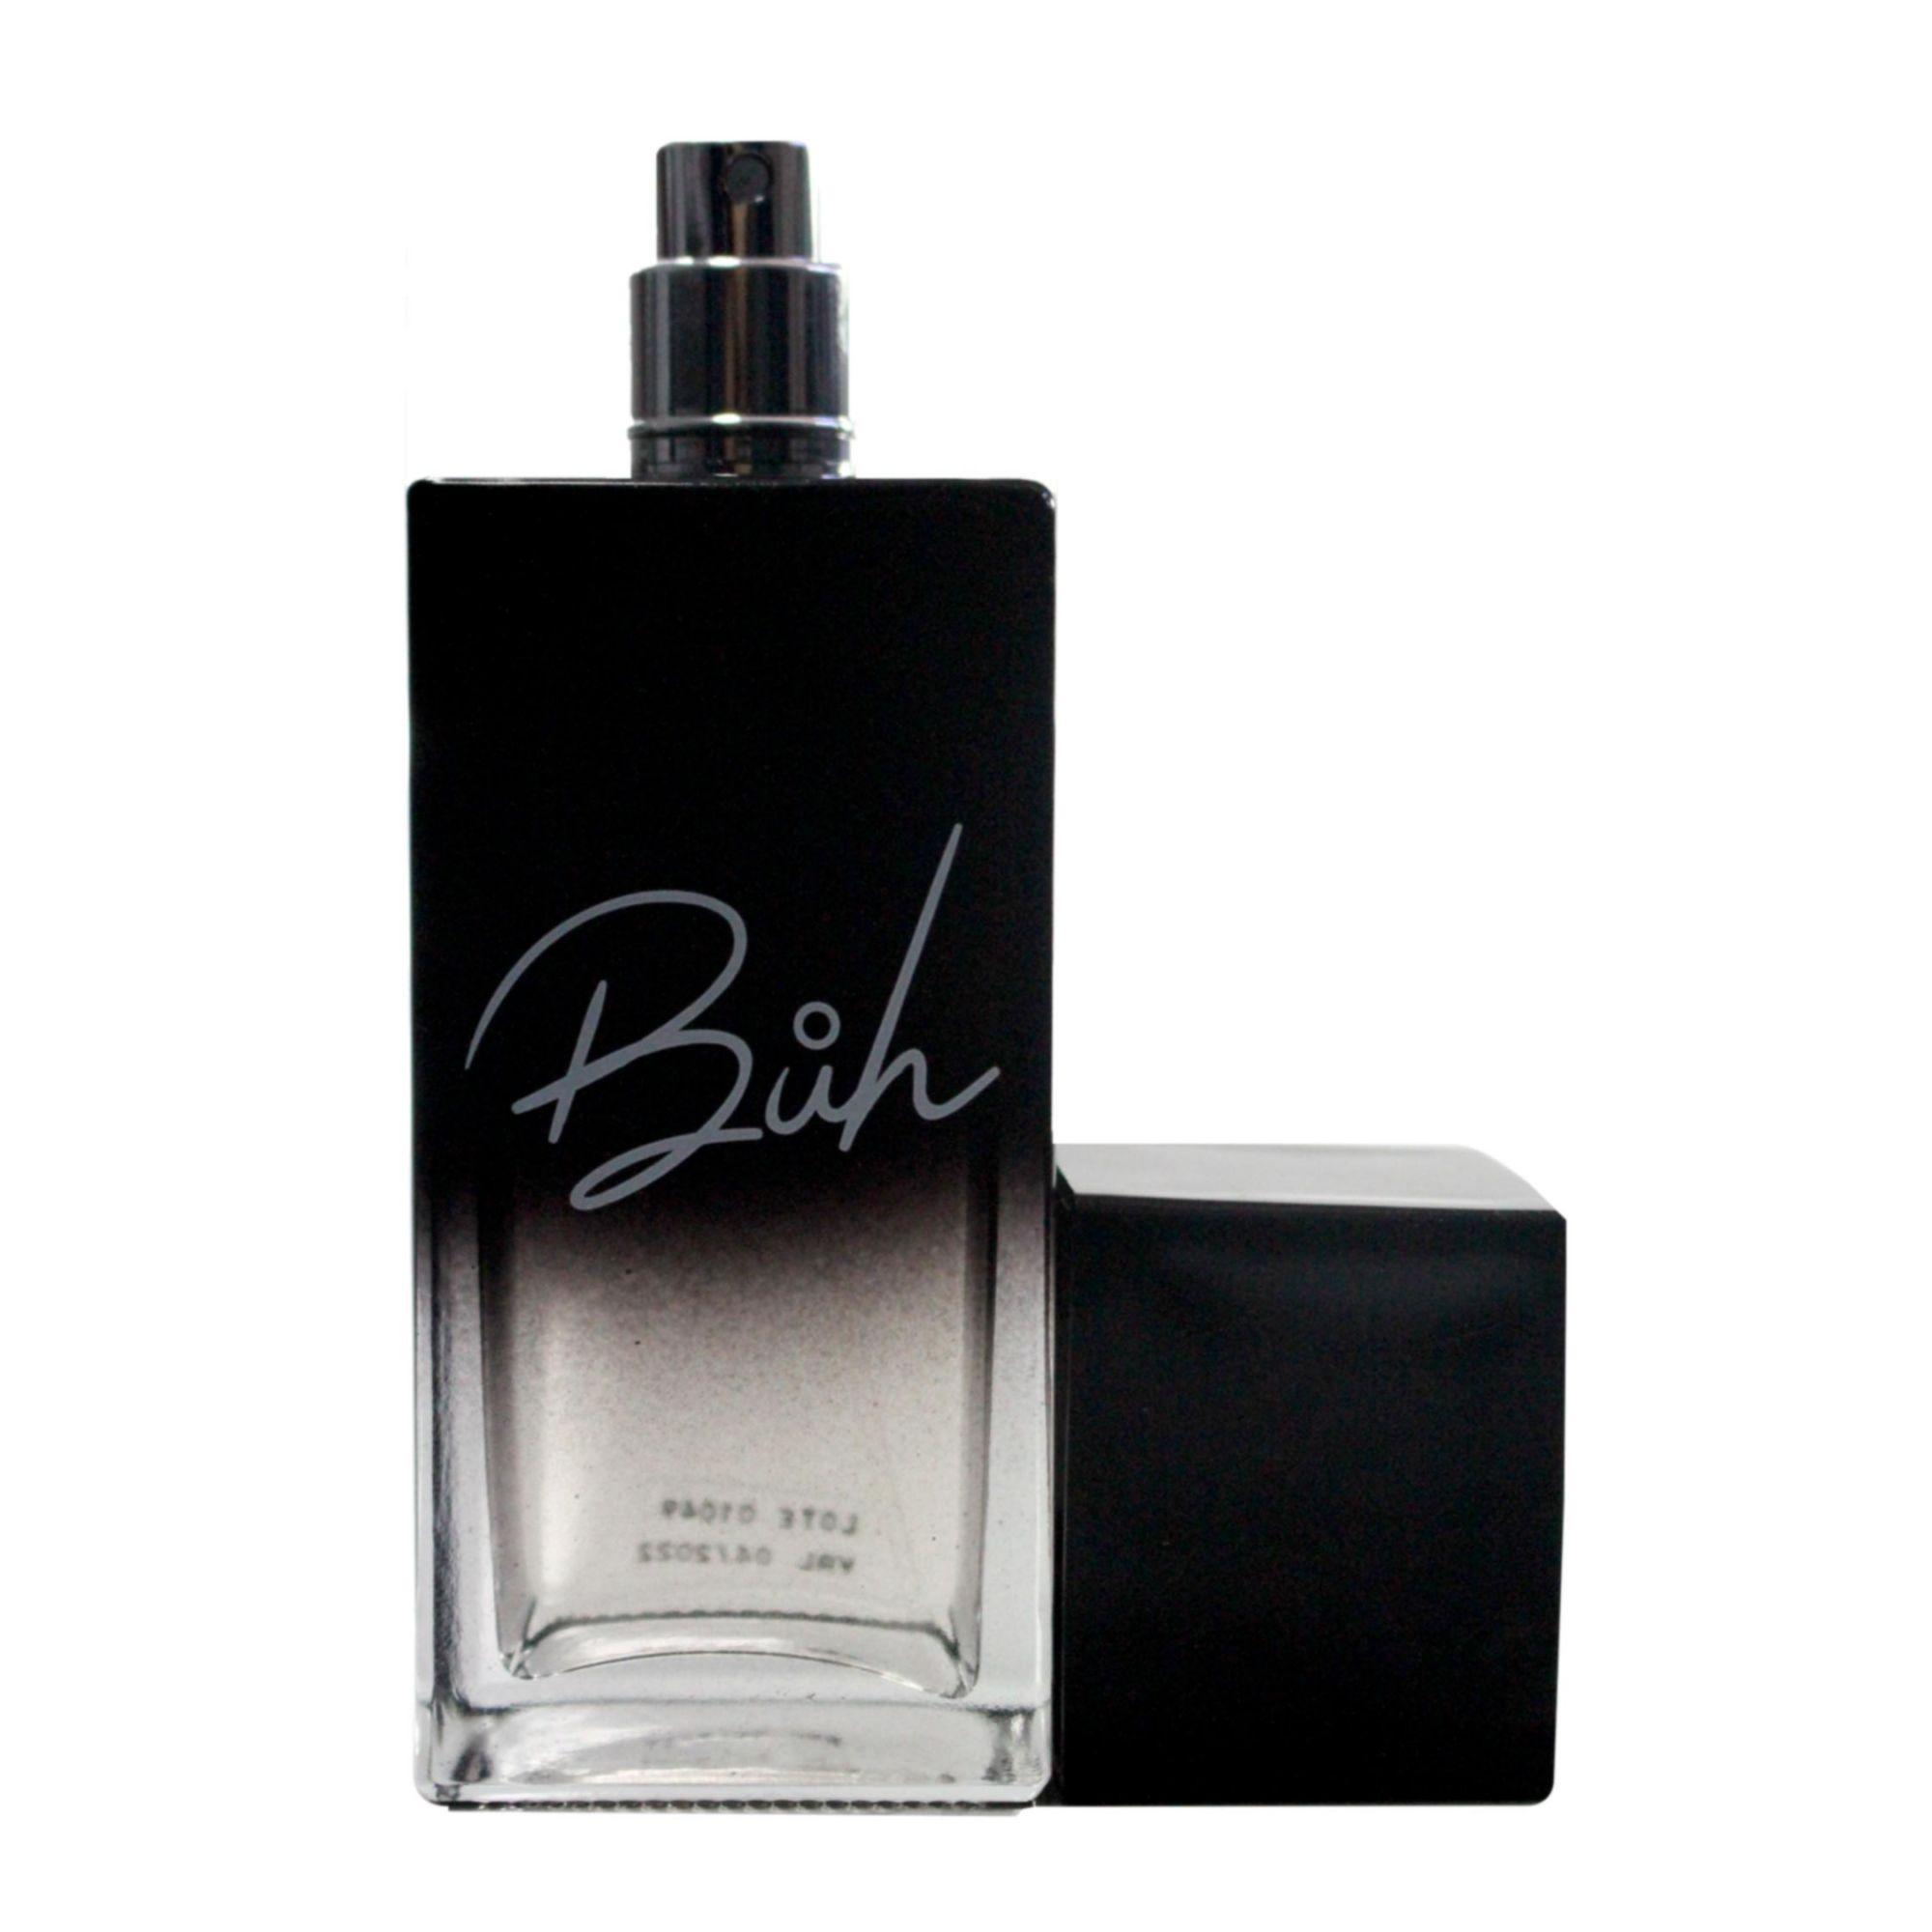 Perfume Buh